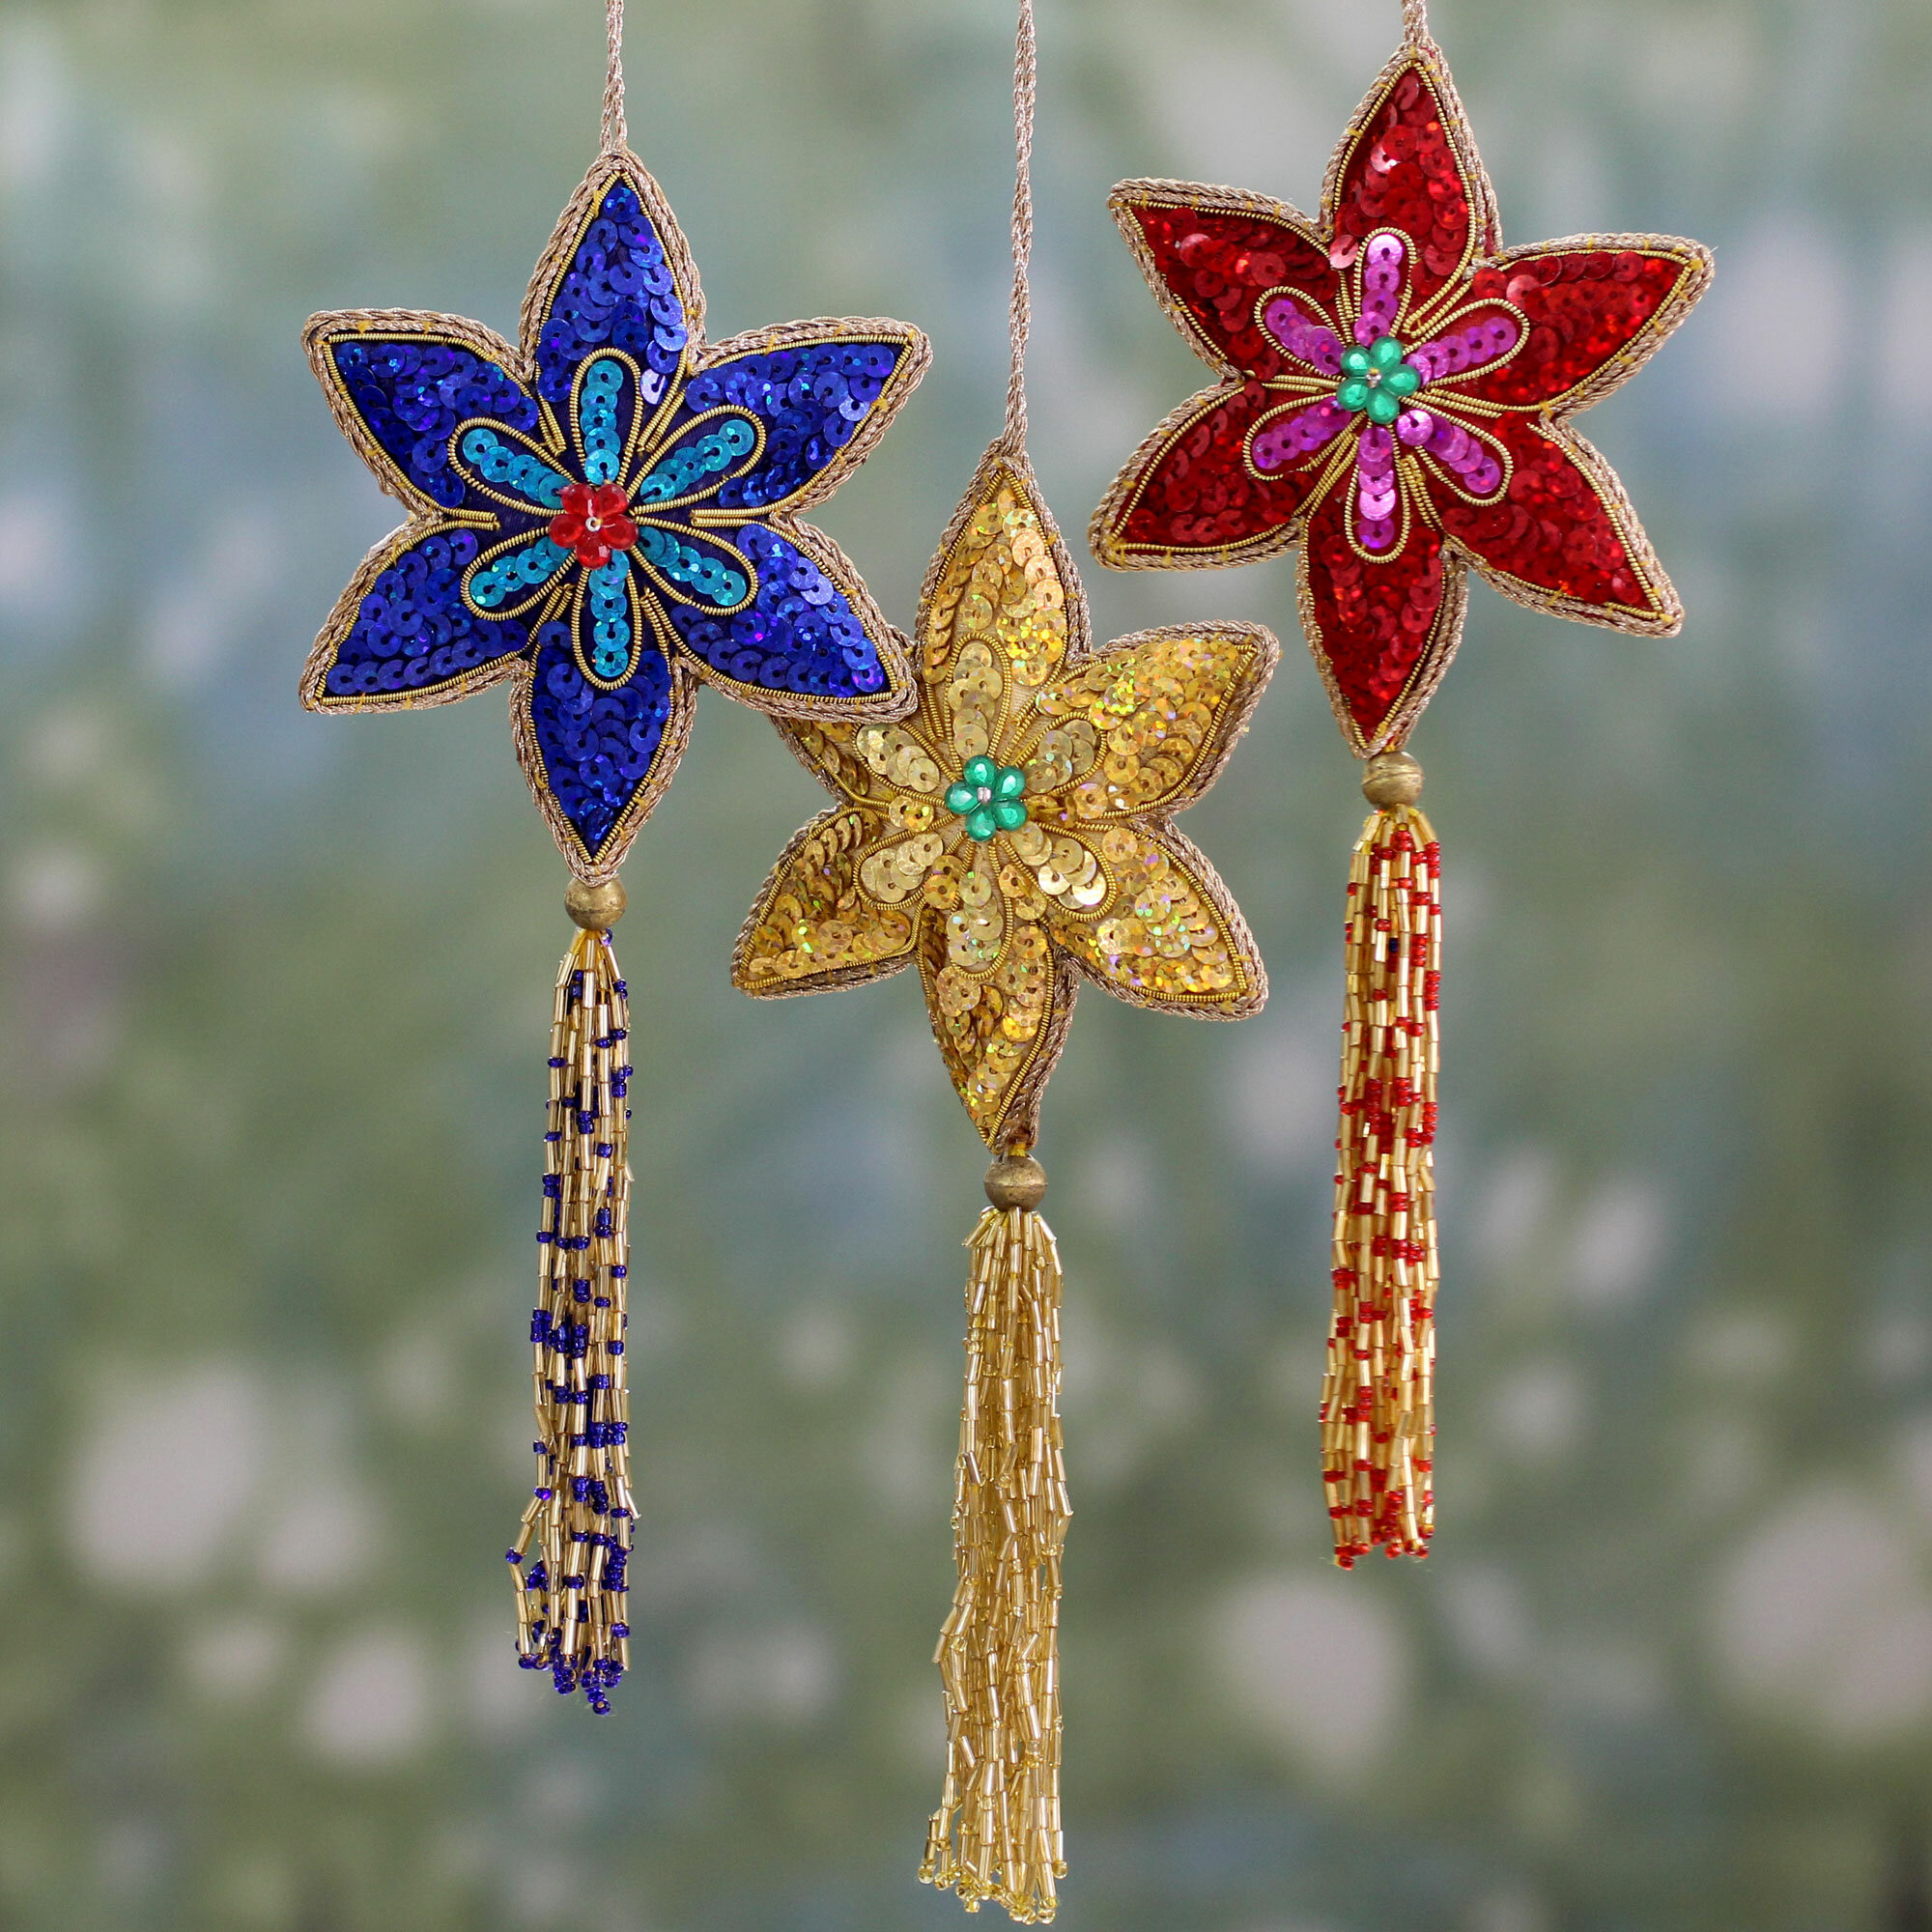 The Holiday Aisle Christmas Handmade Beaded Sequin Colorful Hanging Figurine Ornament Set Of 3 Wayfair